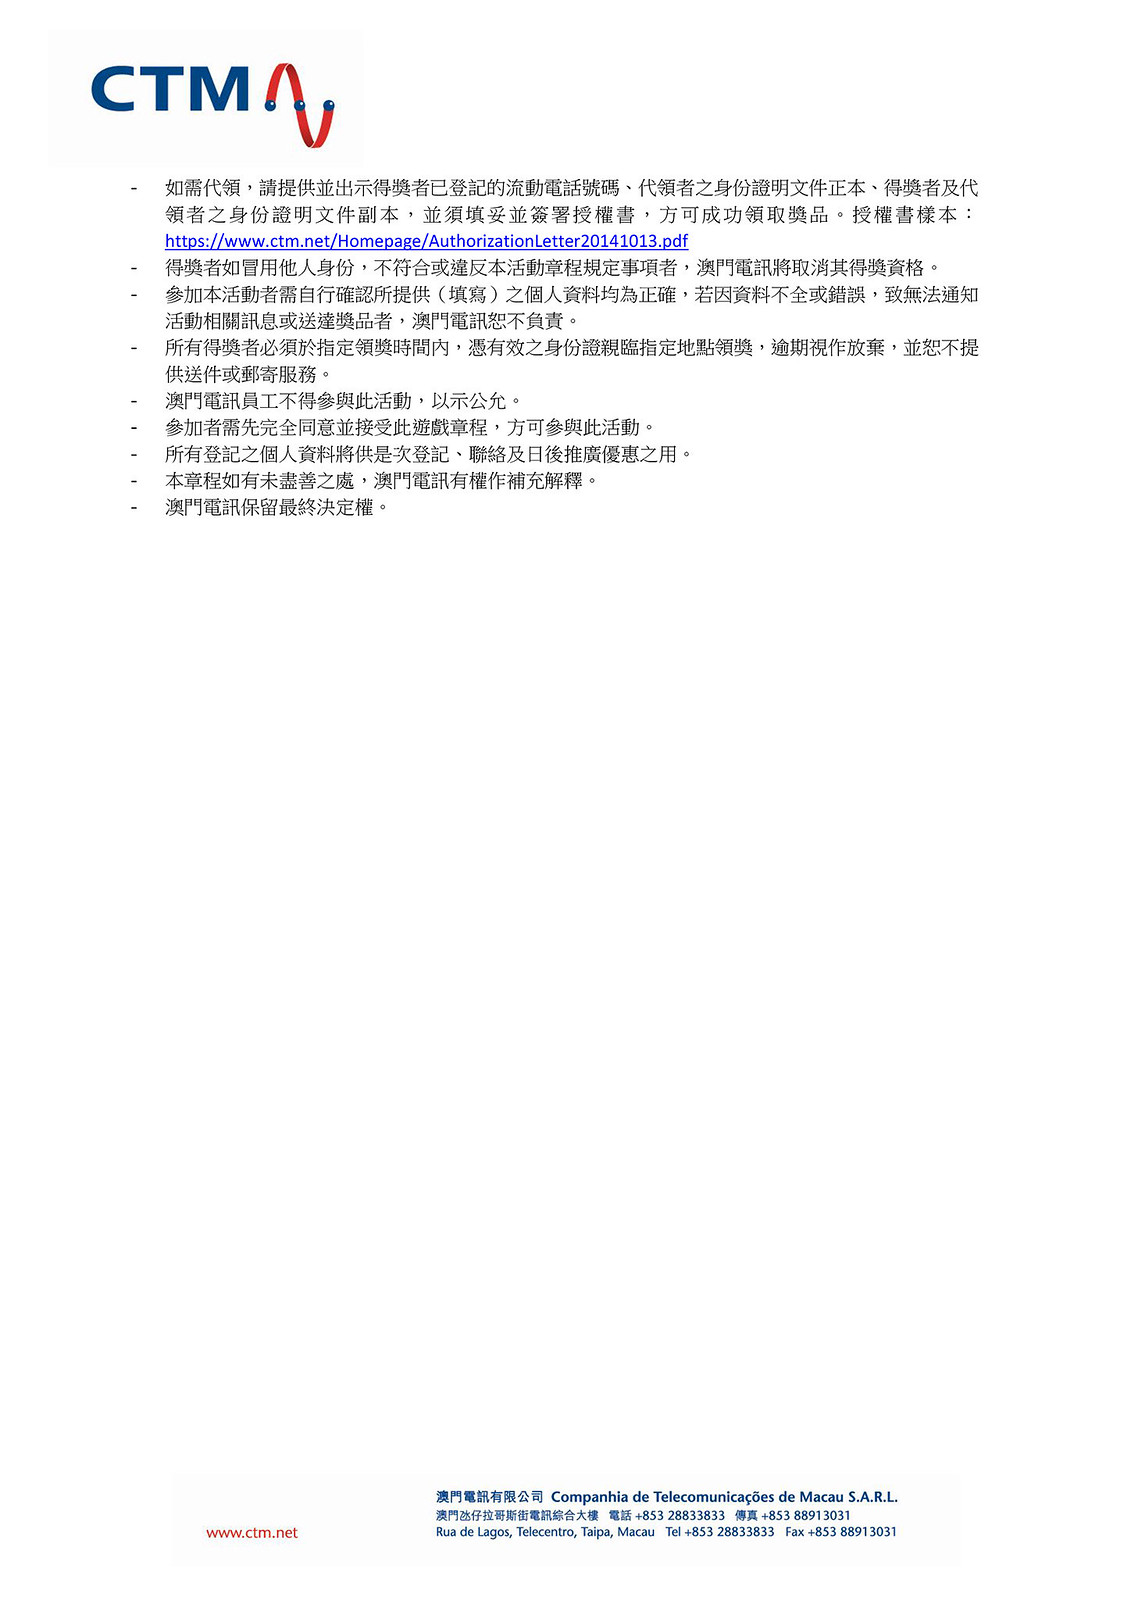 CTMxSamsung_20180409-3